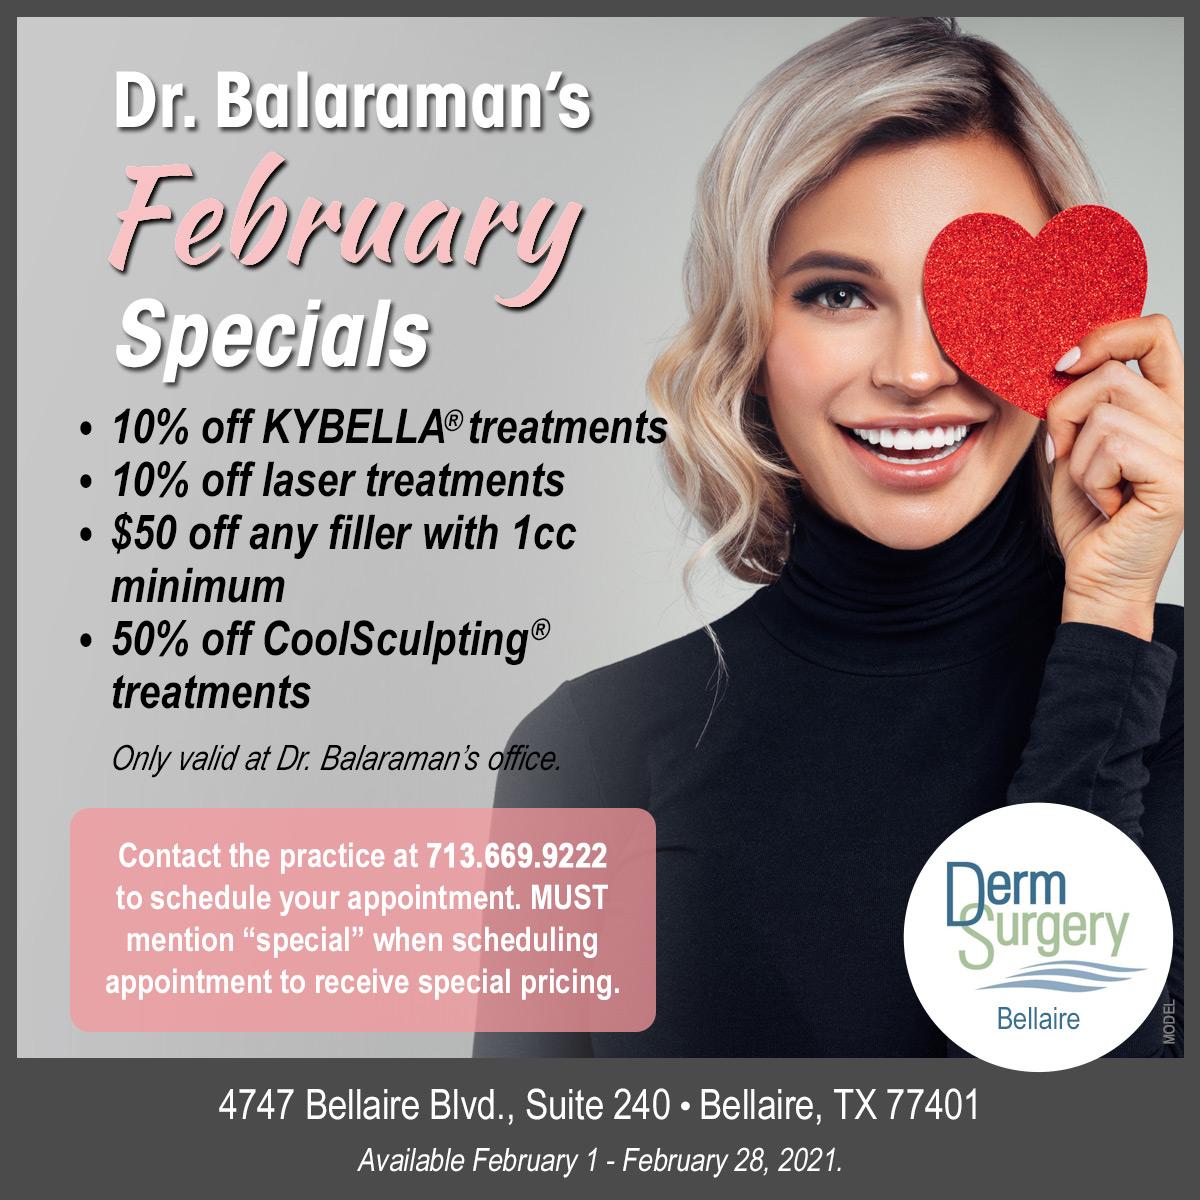 Dr. Balaraman's February Special